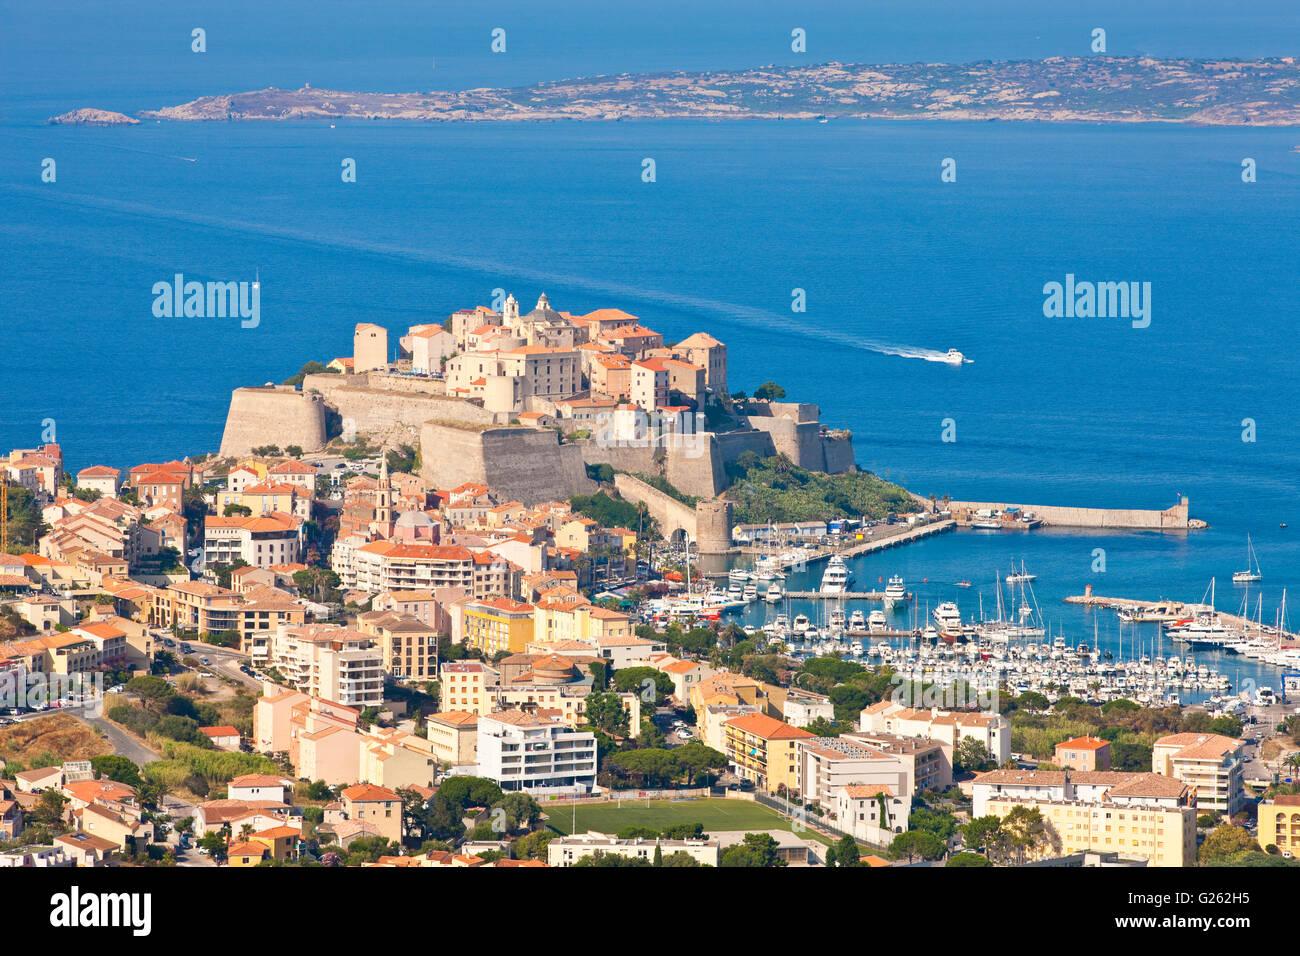 Citadel of Calvi, Corsica, France - Stock Image